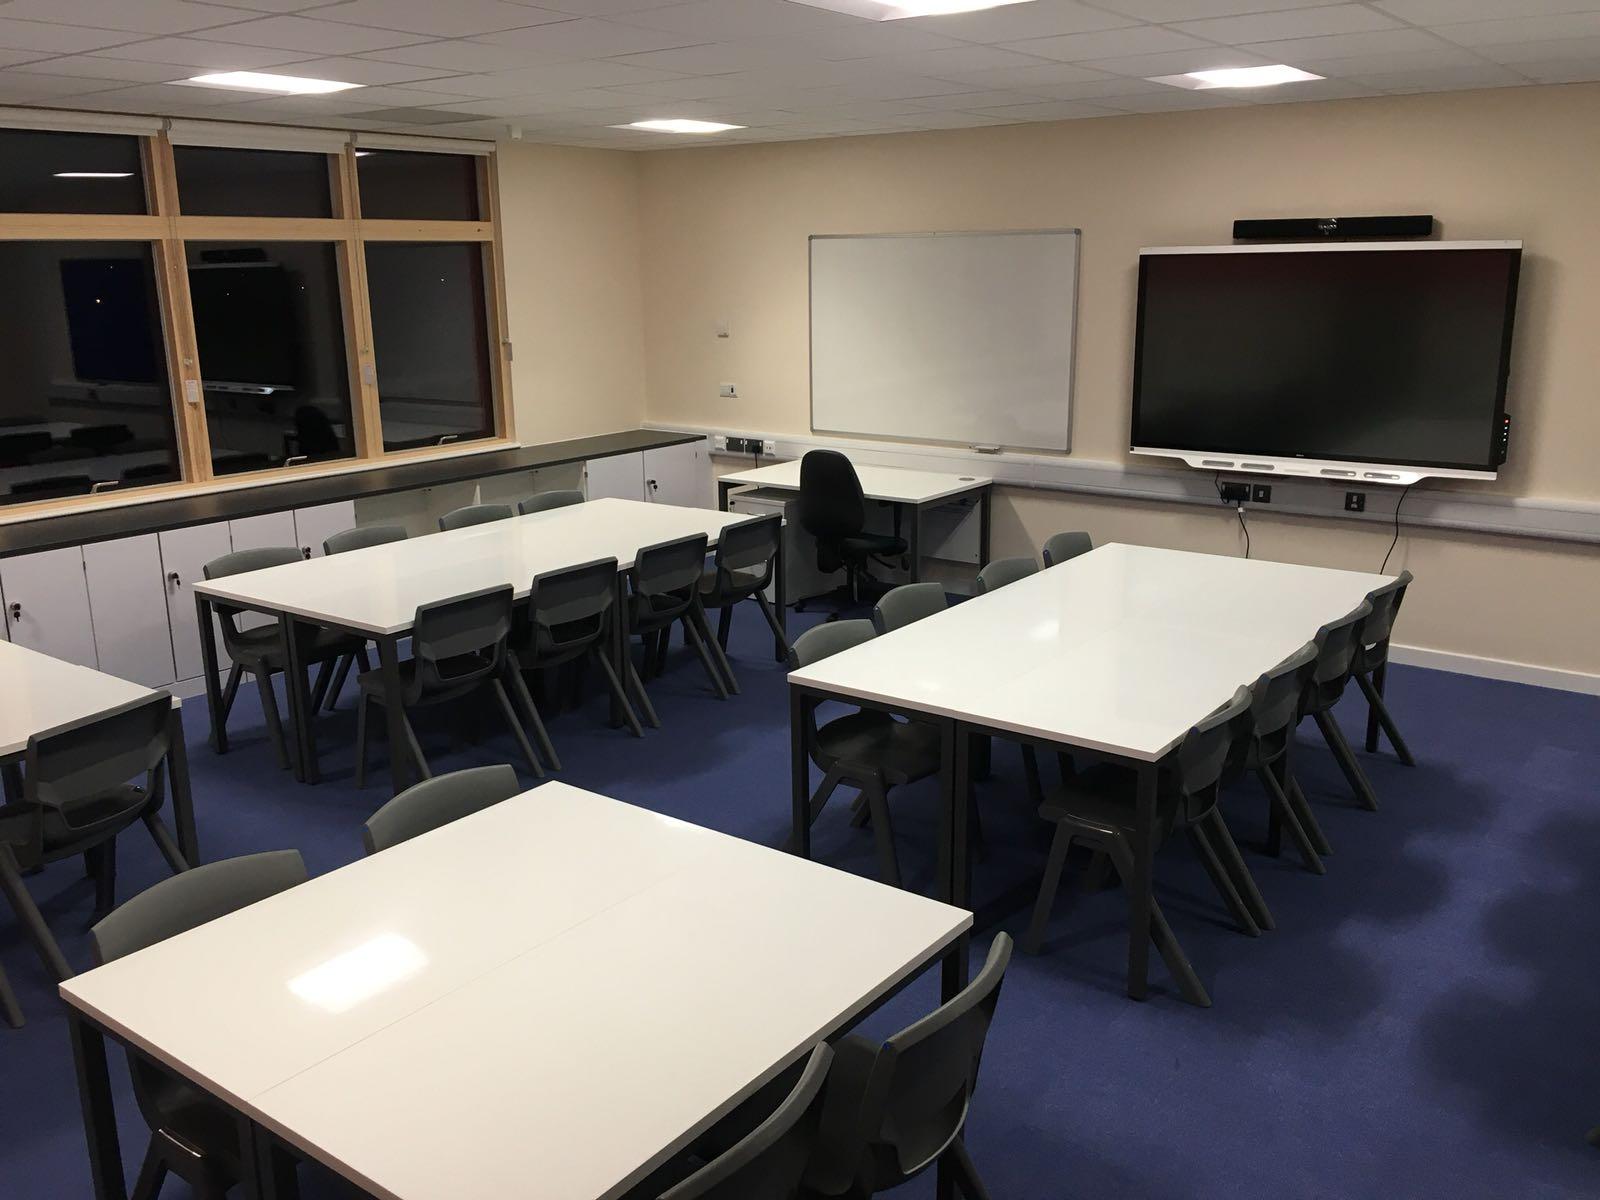 Classroom Refurb Dry-wipe table tops